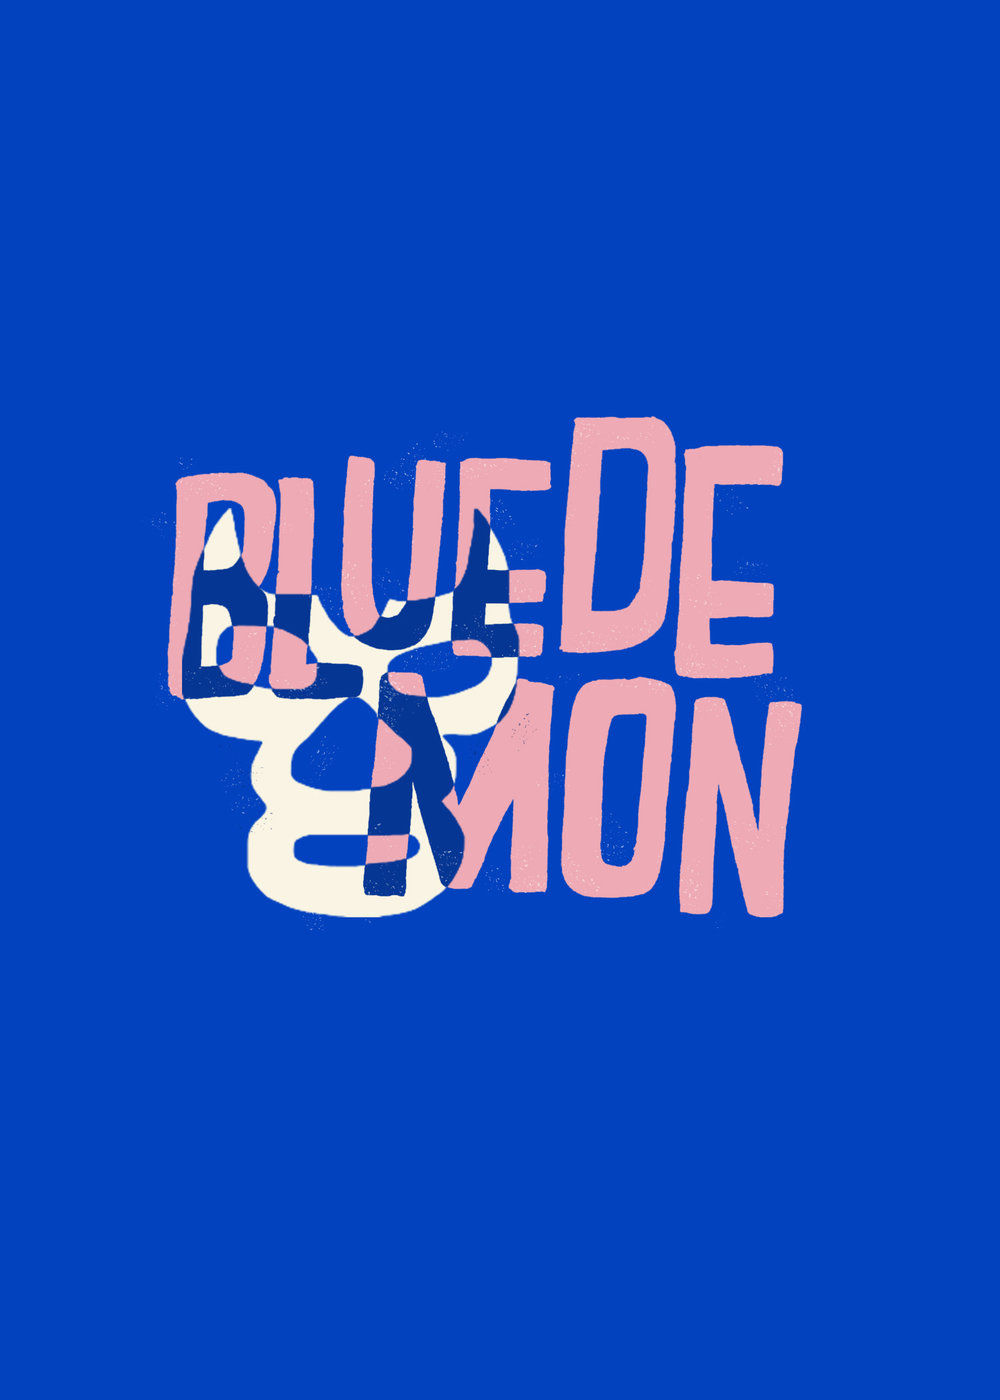 4.BlueDemon.jpg